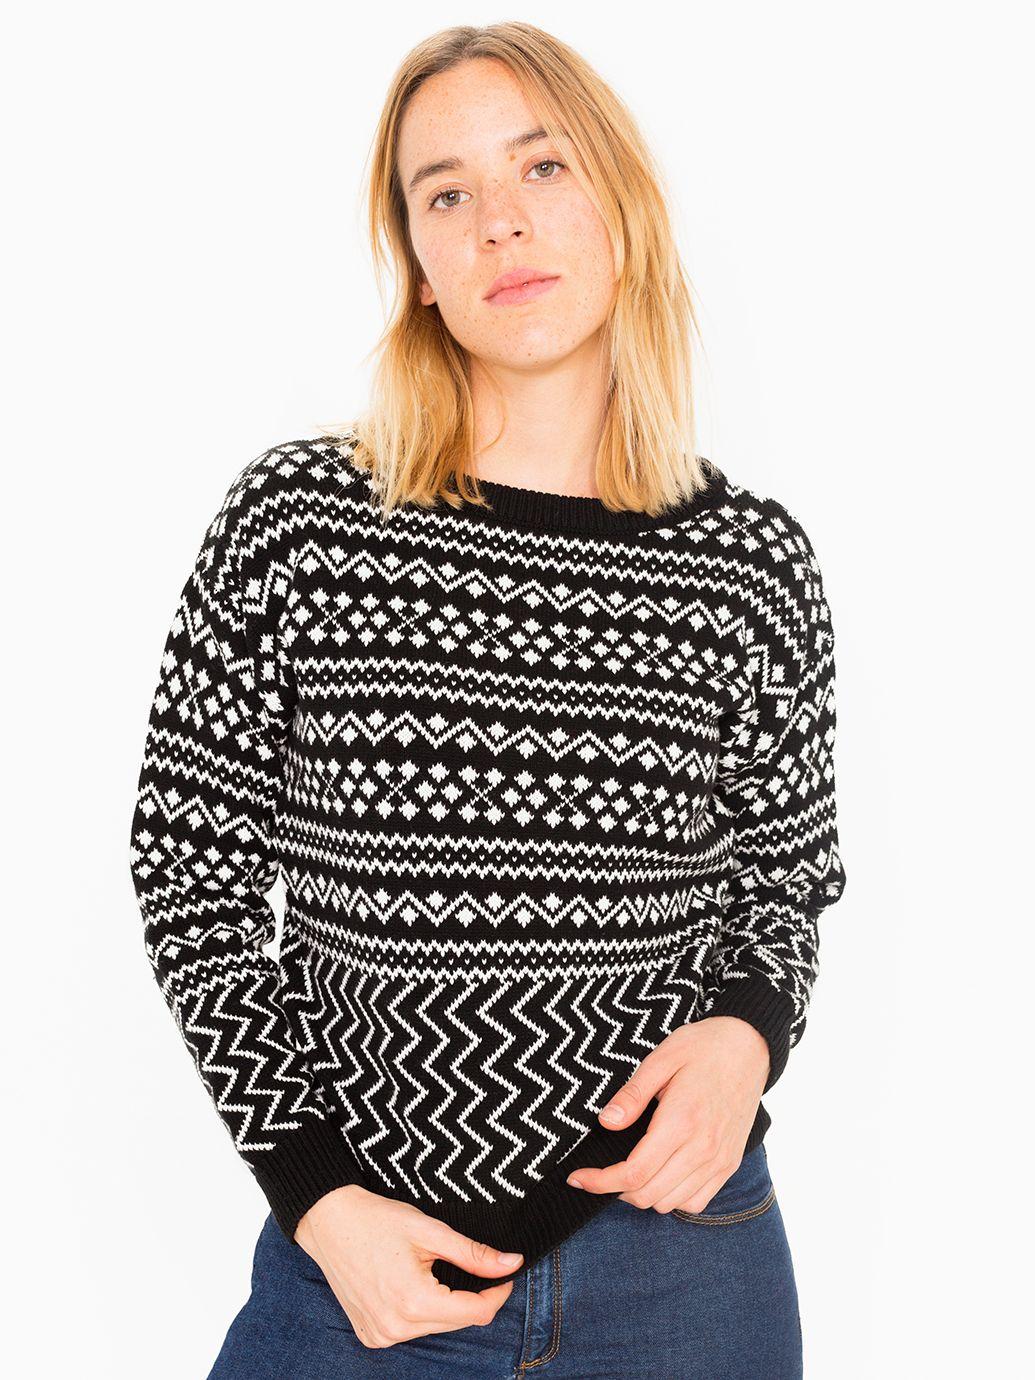 White Ski Sweater 102